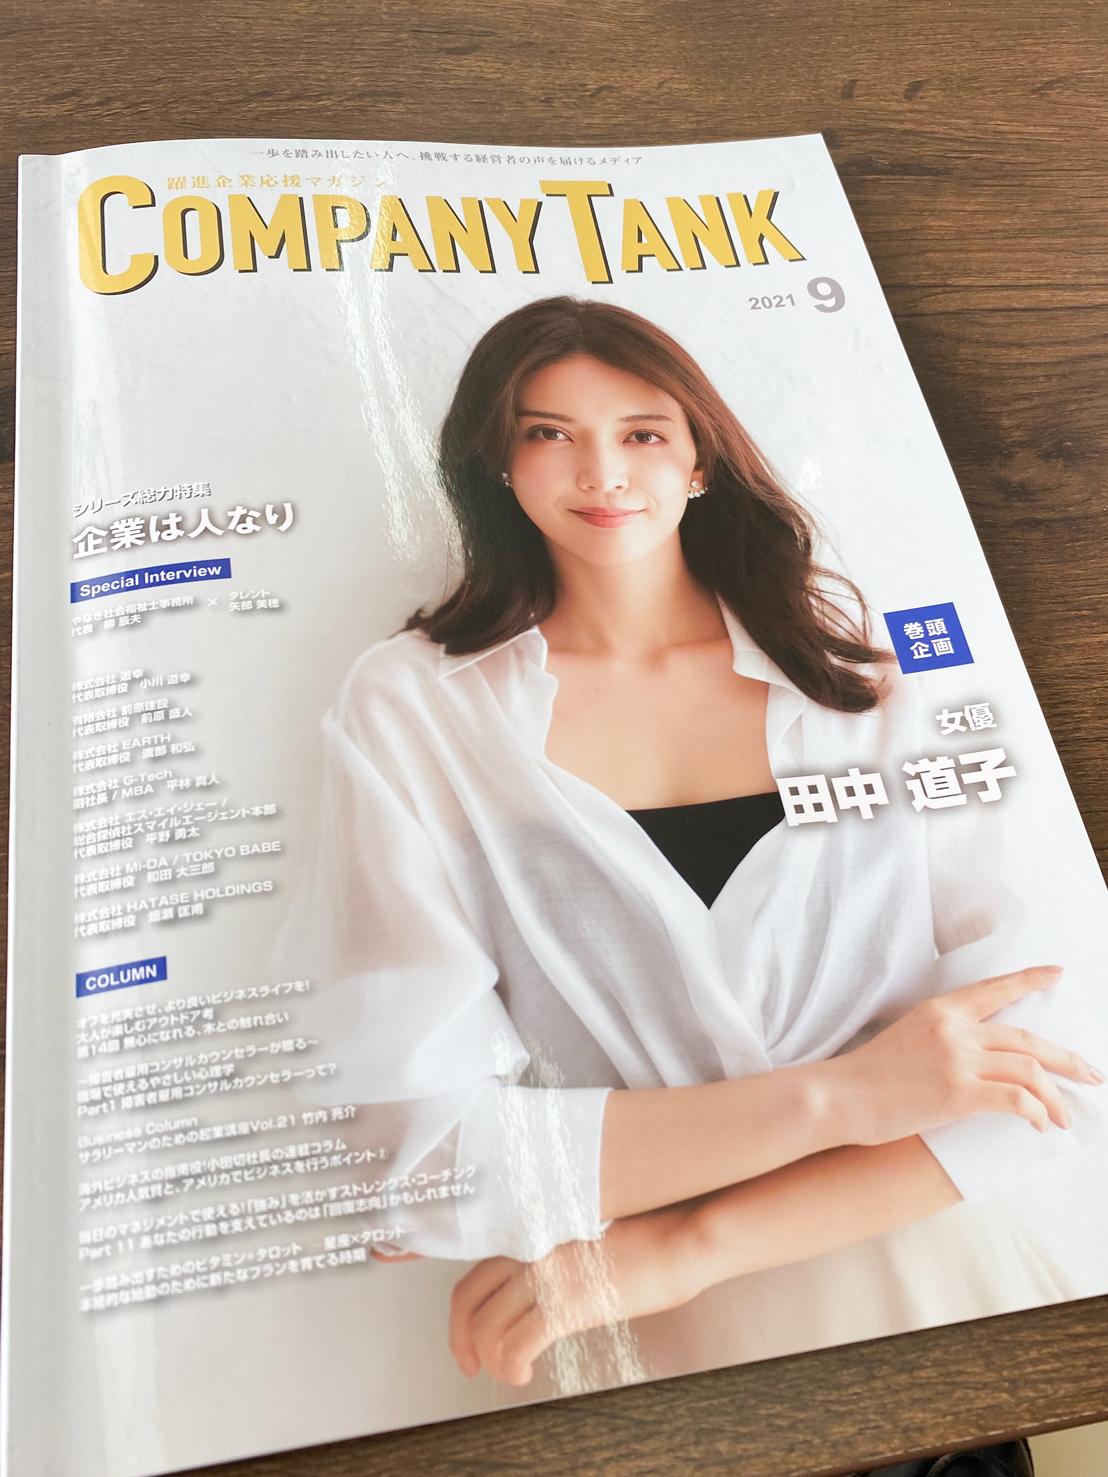 COMPANY TANK 2021年9月号 表紙:フジヤマ建装